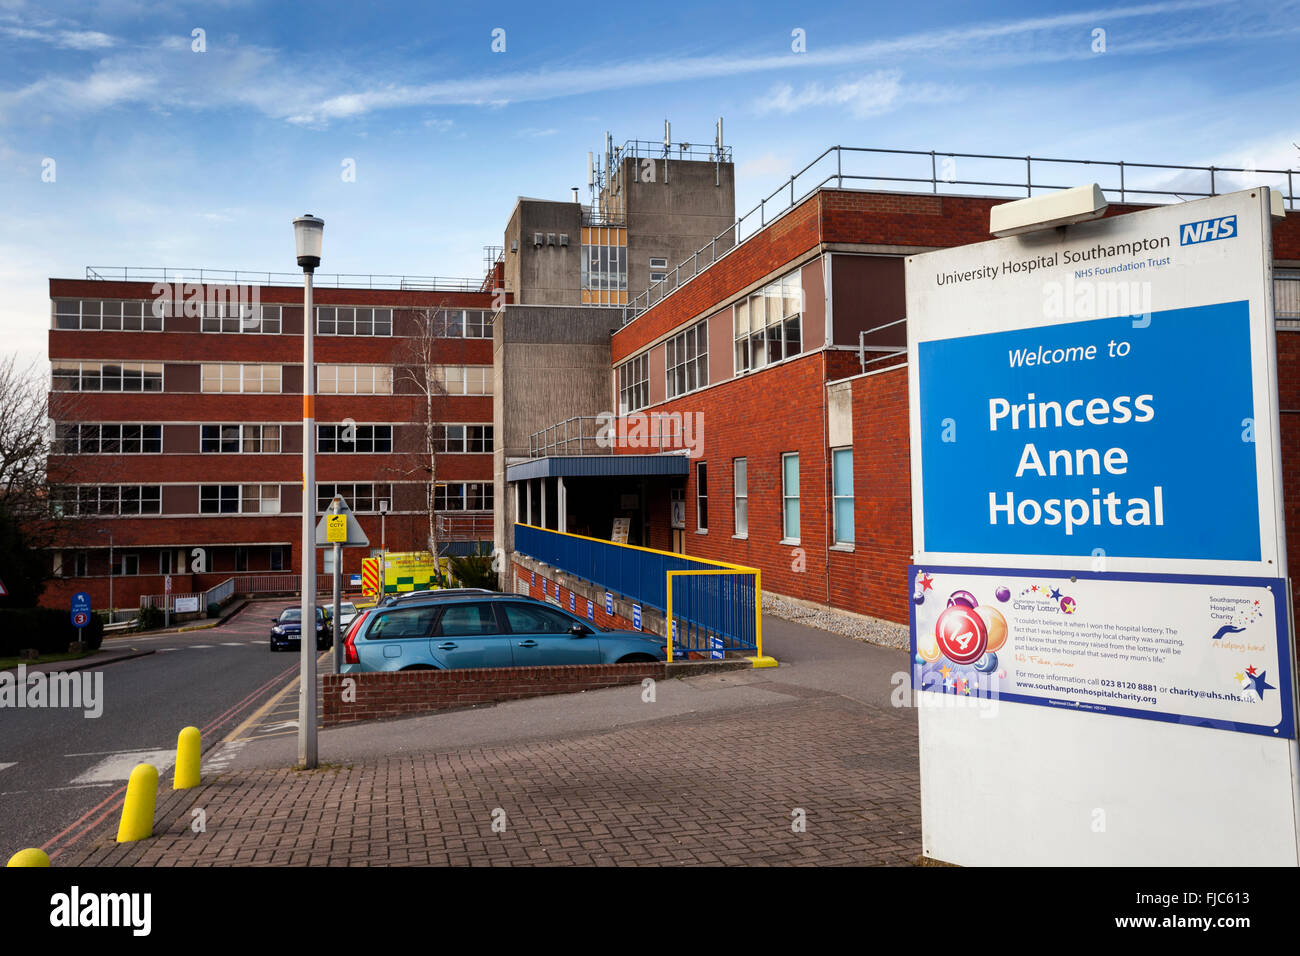 La princesse Anne Hospital à Southampton, Hampshire, Royaume-Uni Photo Stock